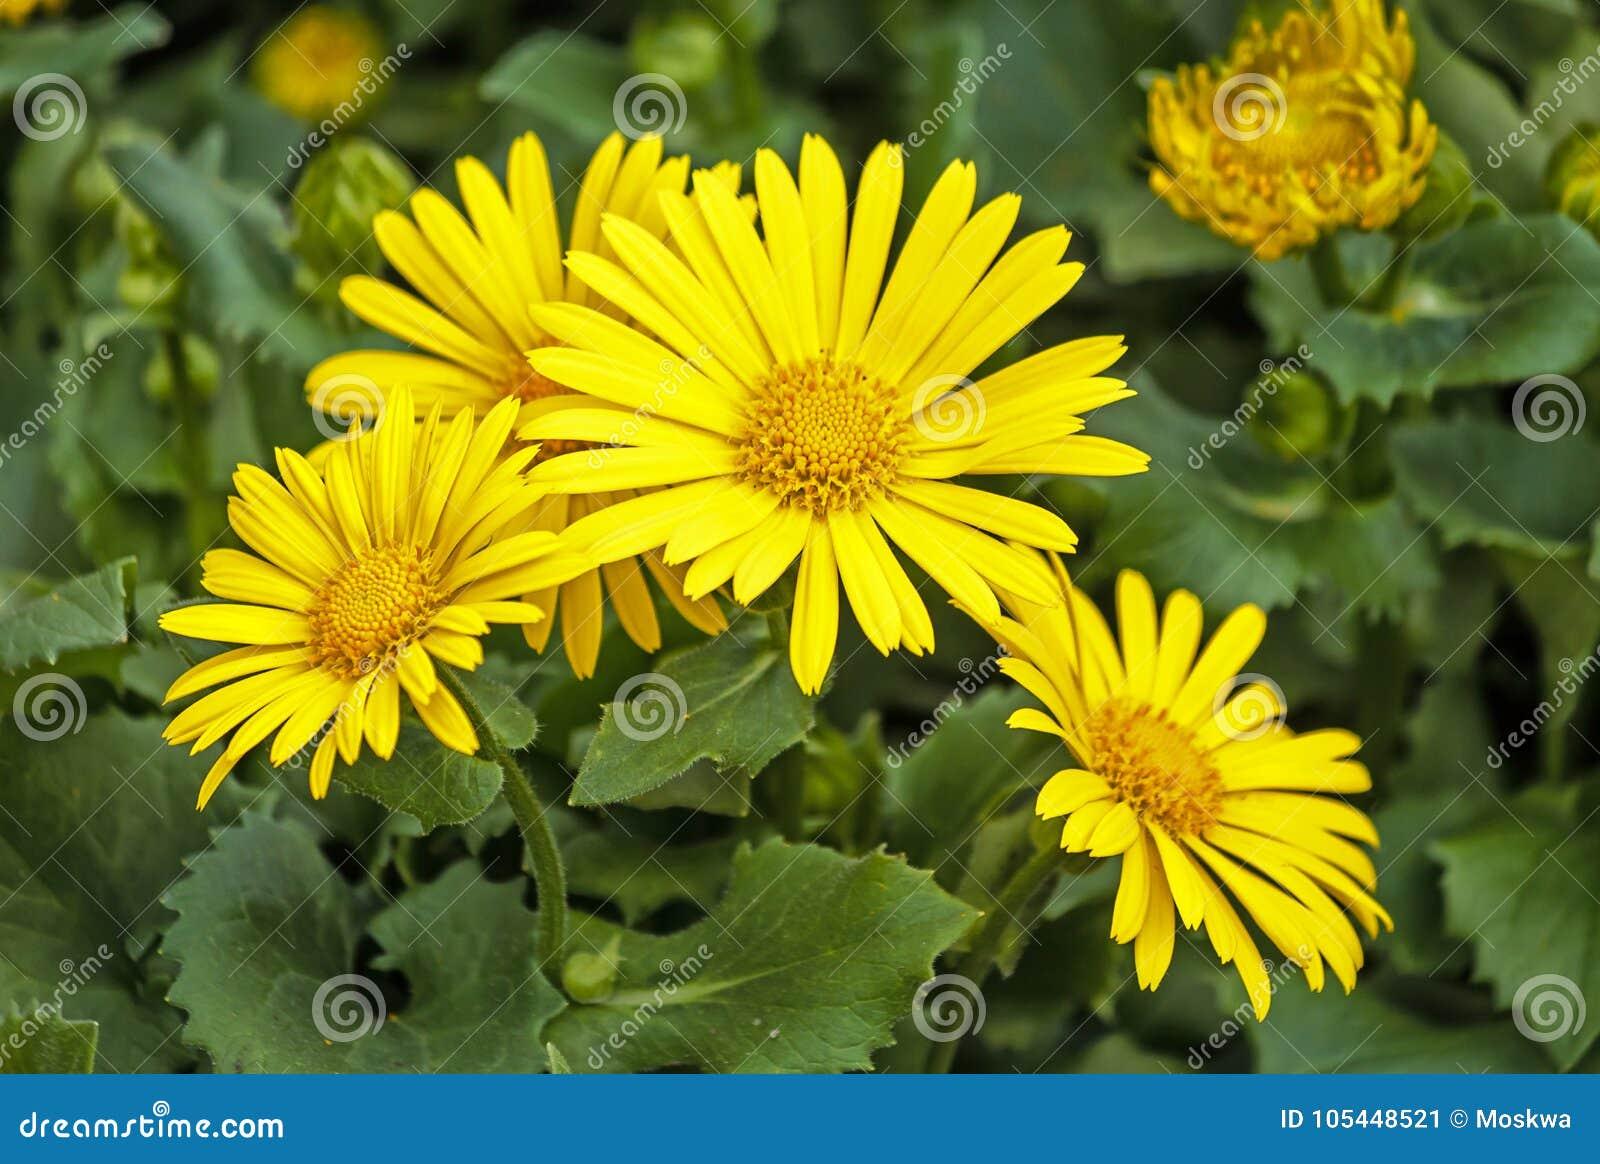 Doronicum Orientale Yellow Daisy Like Flowers Stock Image Image